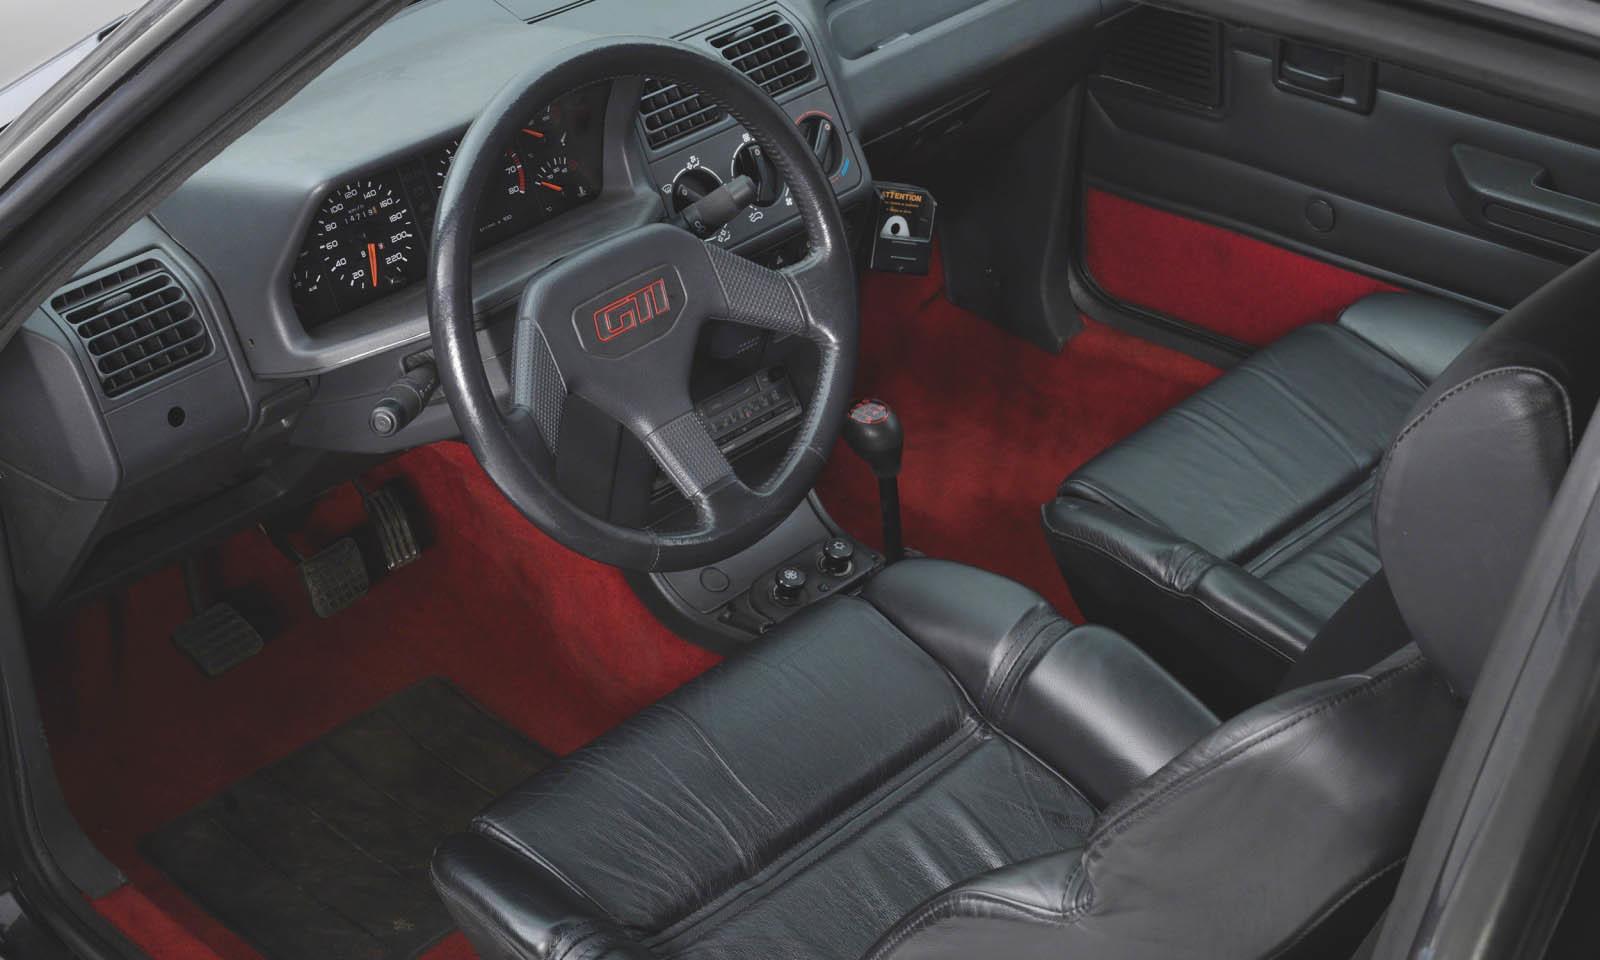 Peugeot 205 GTI 1.9 blindado ex Bernard Arnault